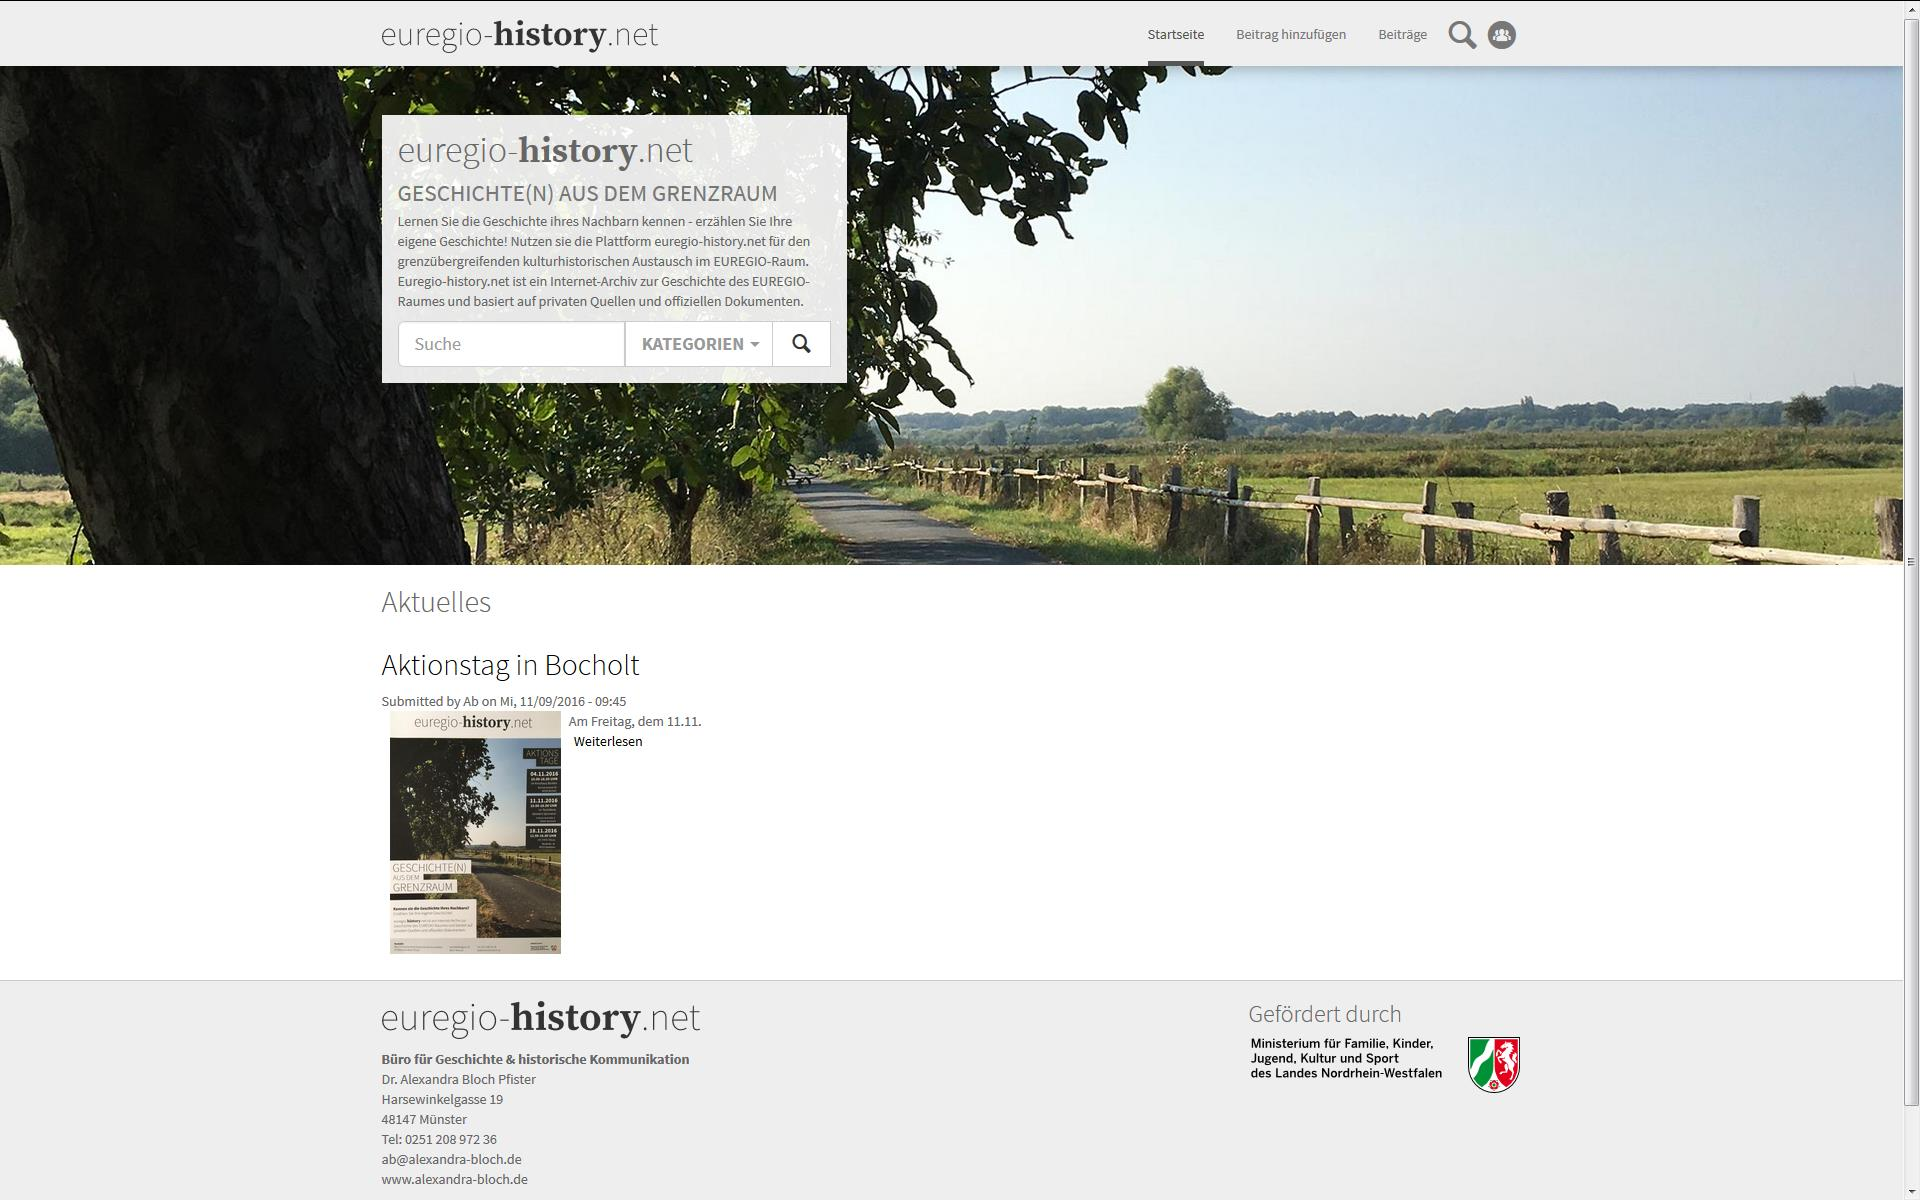 euregio-history-net